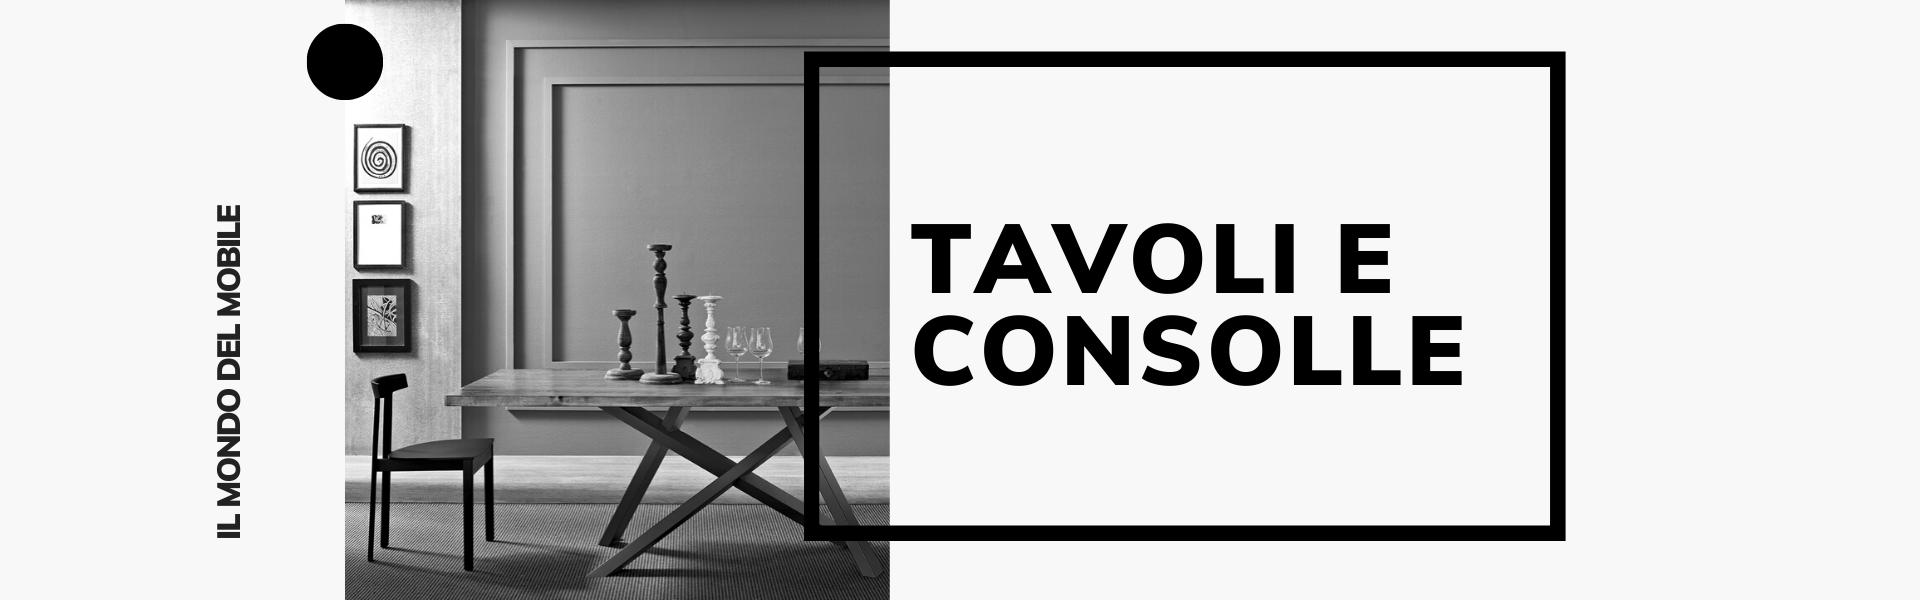 tavoli e consolle a roma